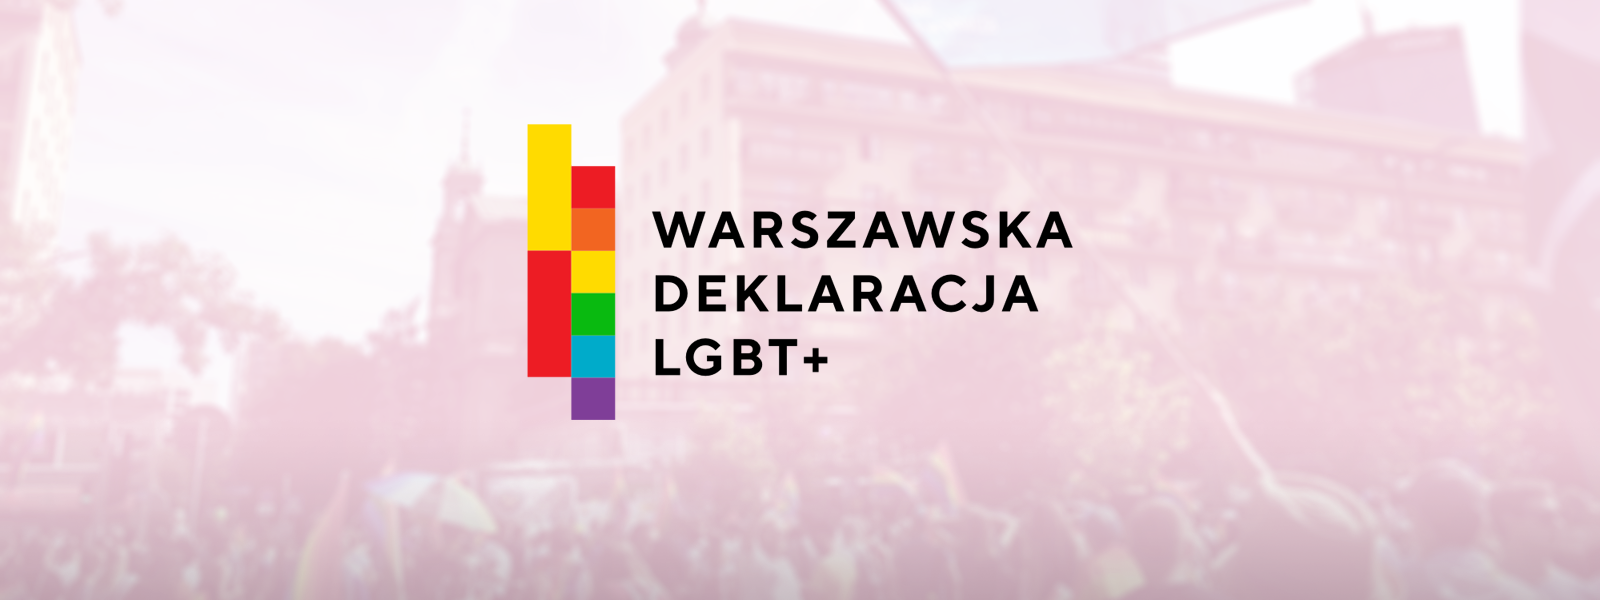 Warszawska Deklaracja LGBT+